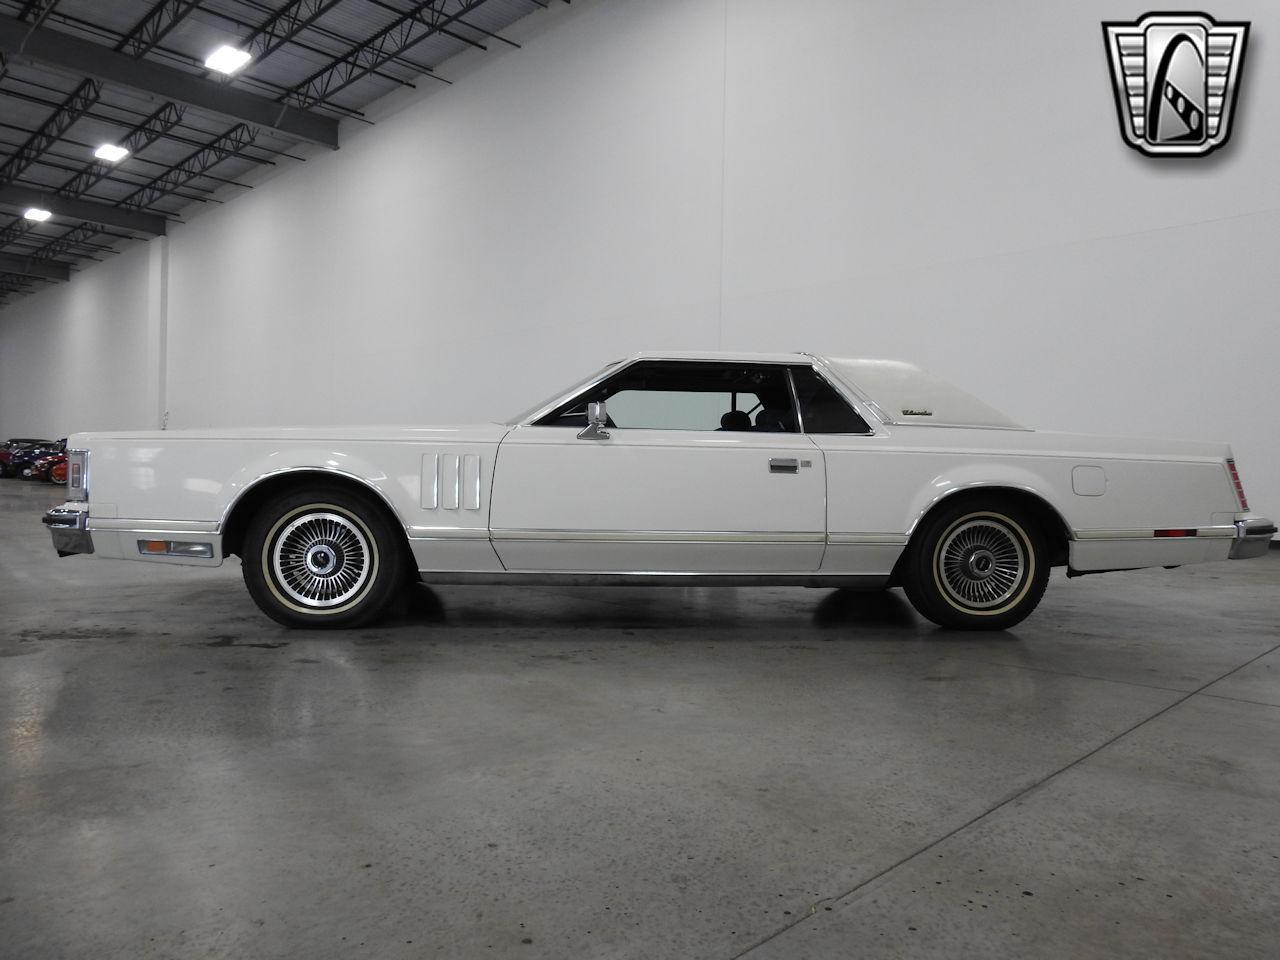 1979 Lincoln MKV 27